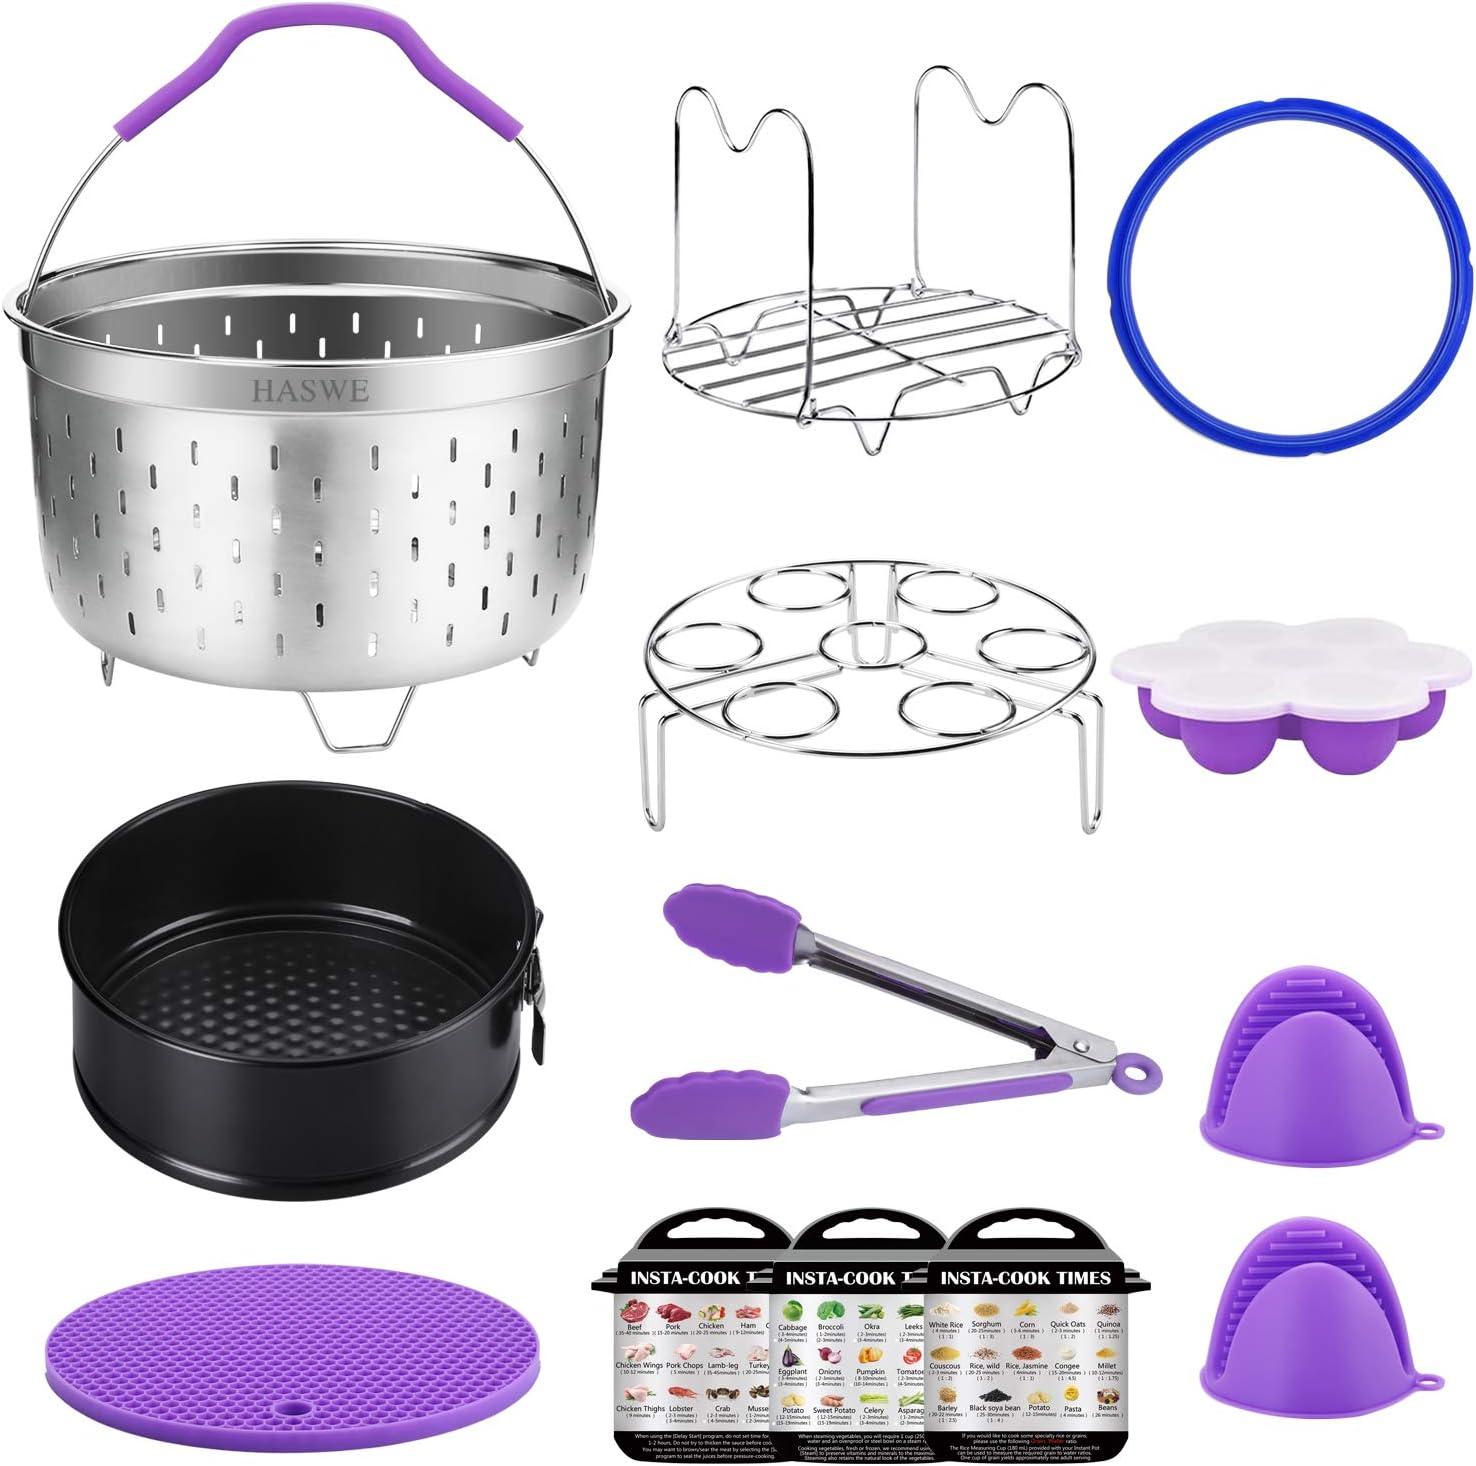 Haswe Accessories Set for Instant Pot 6/5 qt,Fit Instapot Pressure Cookers, Steamer Baskets/Non-Stick Springform Pan/Steamer Rack Trivet/Silicone Egg Bites Mold/Sealing Ring.Dishwasher Safe-6 quart